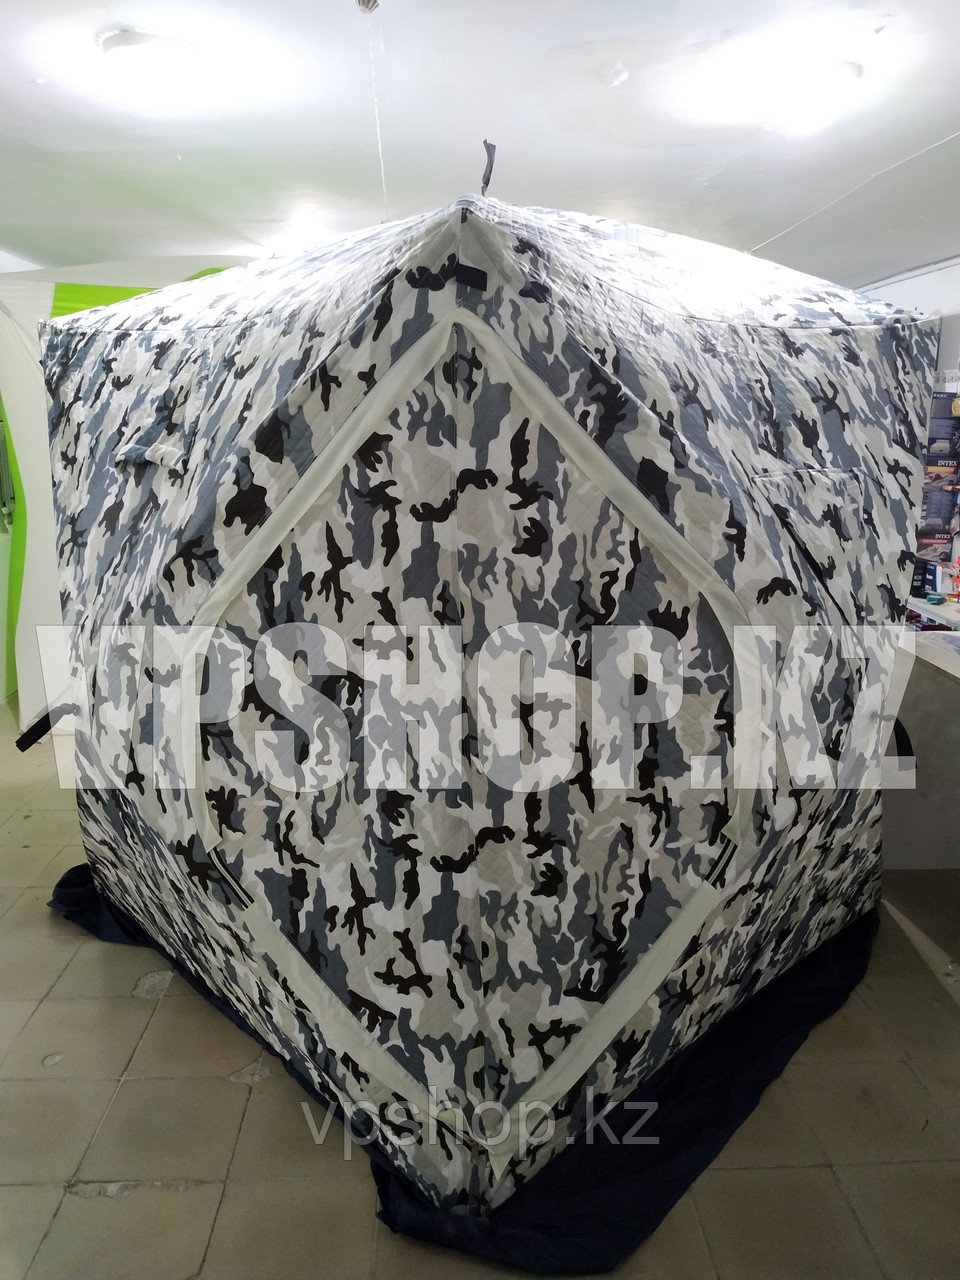 Зимняя палатка TUOHAI th - 1624 куб 3, трехслойная 180х180х200 см., доставка